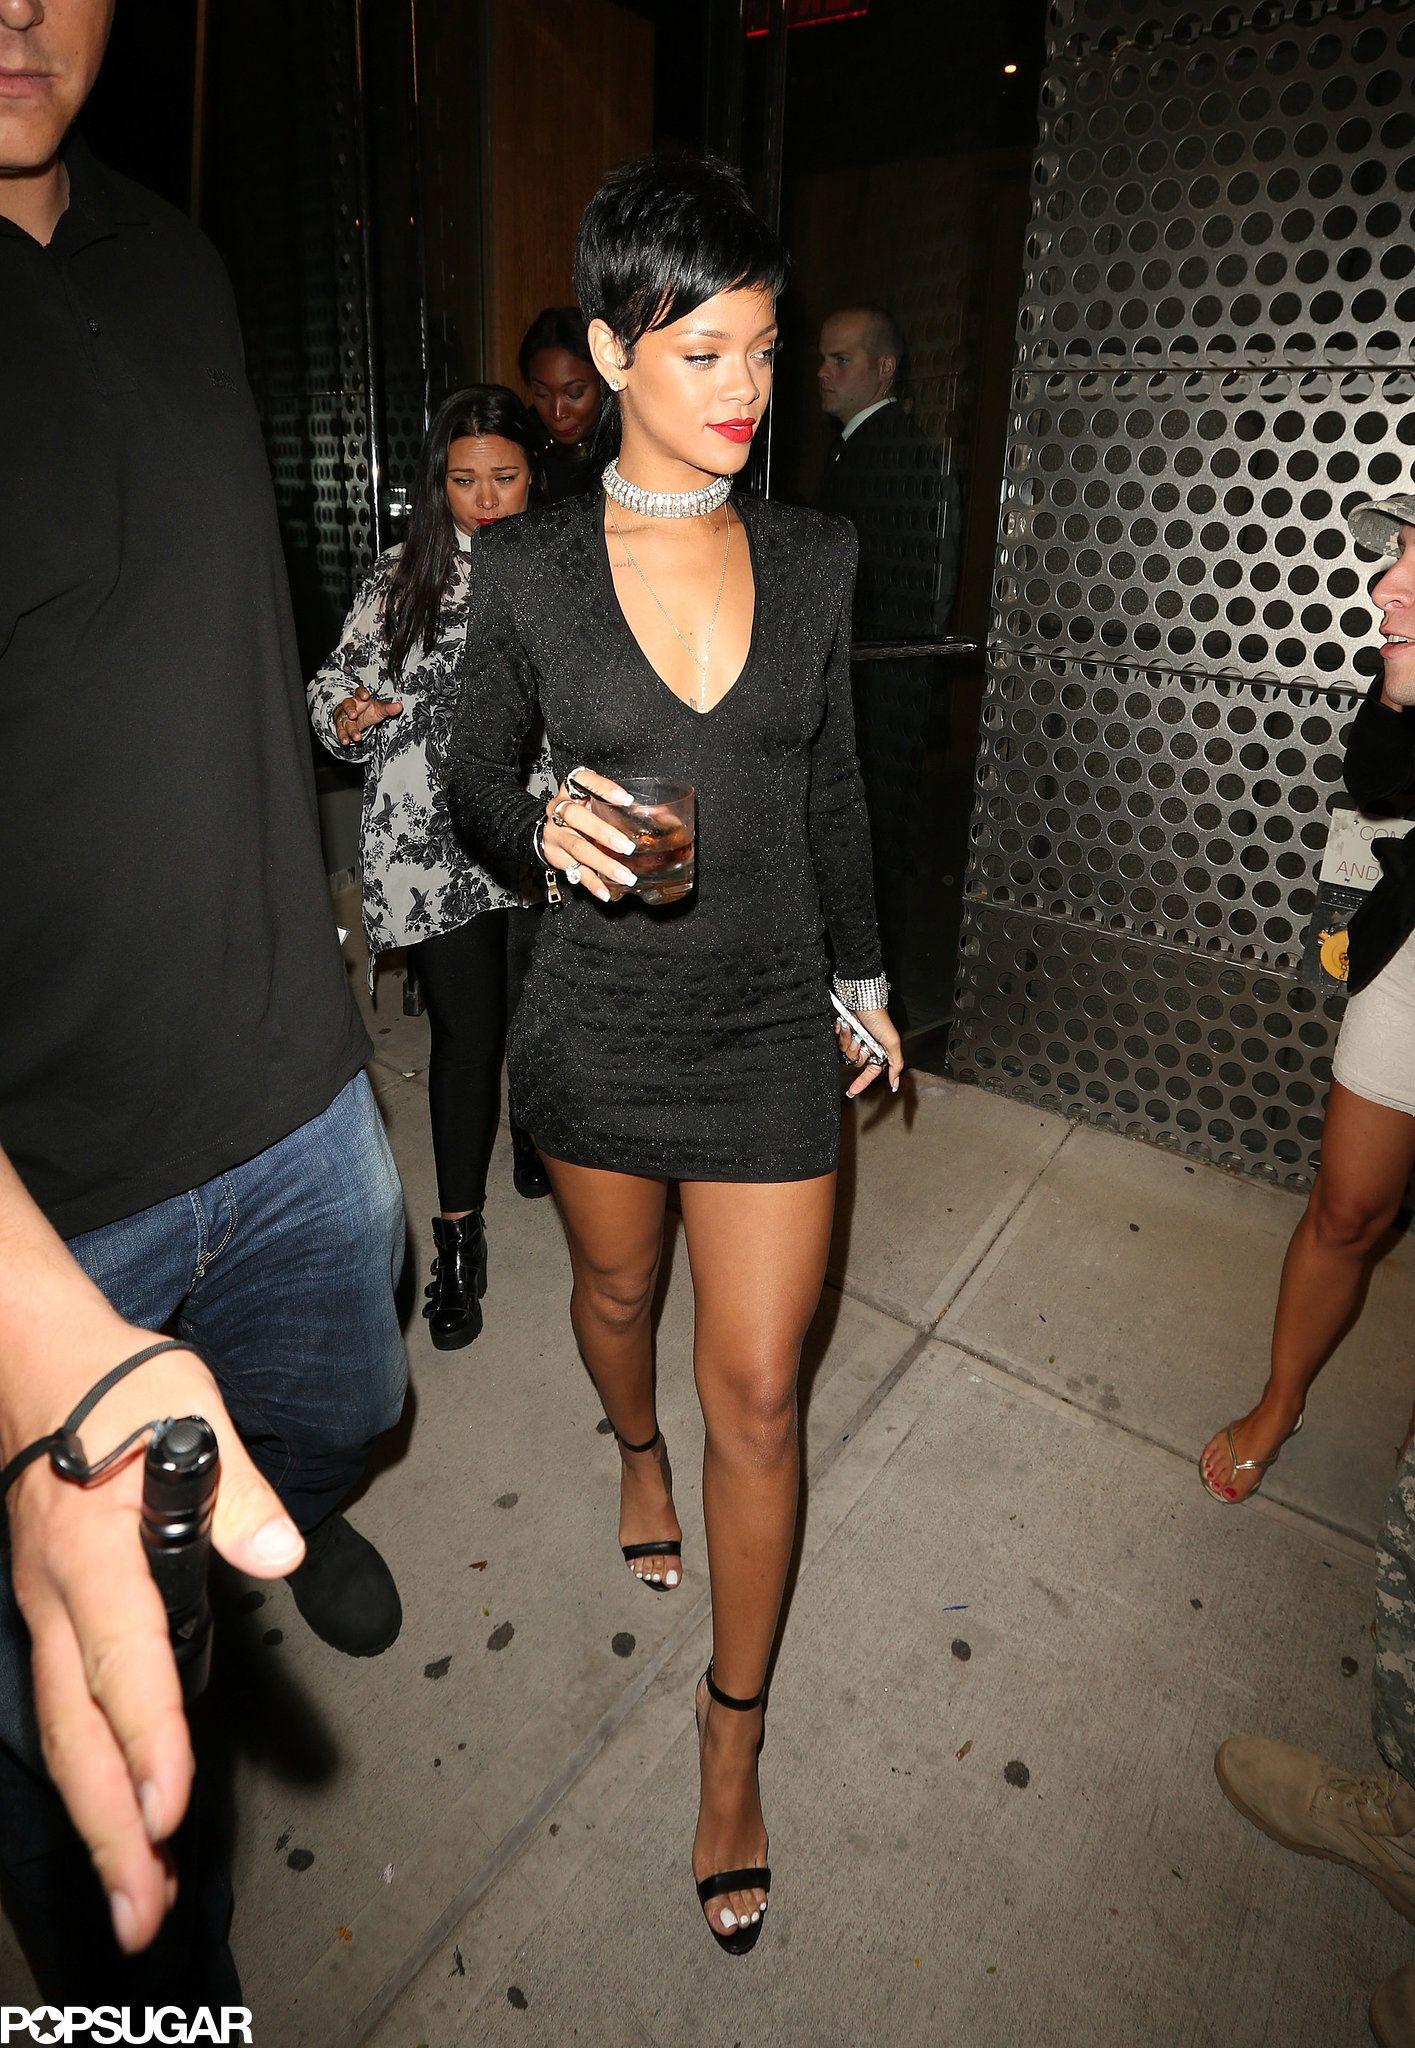 Rihanna Tight Little Black Dress | Nicole Or Rihanna? | Pinterest | Rihanna Celebrity and Black